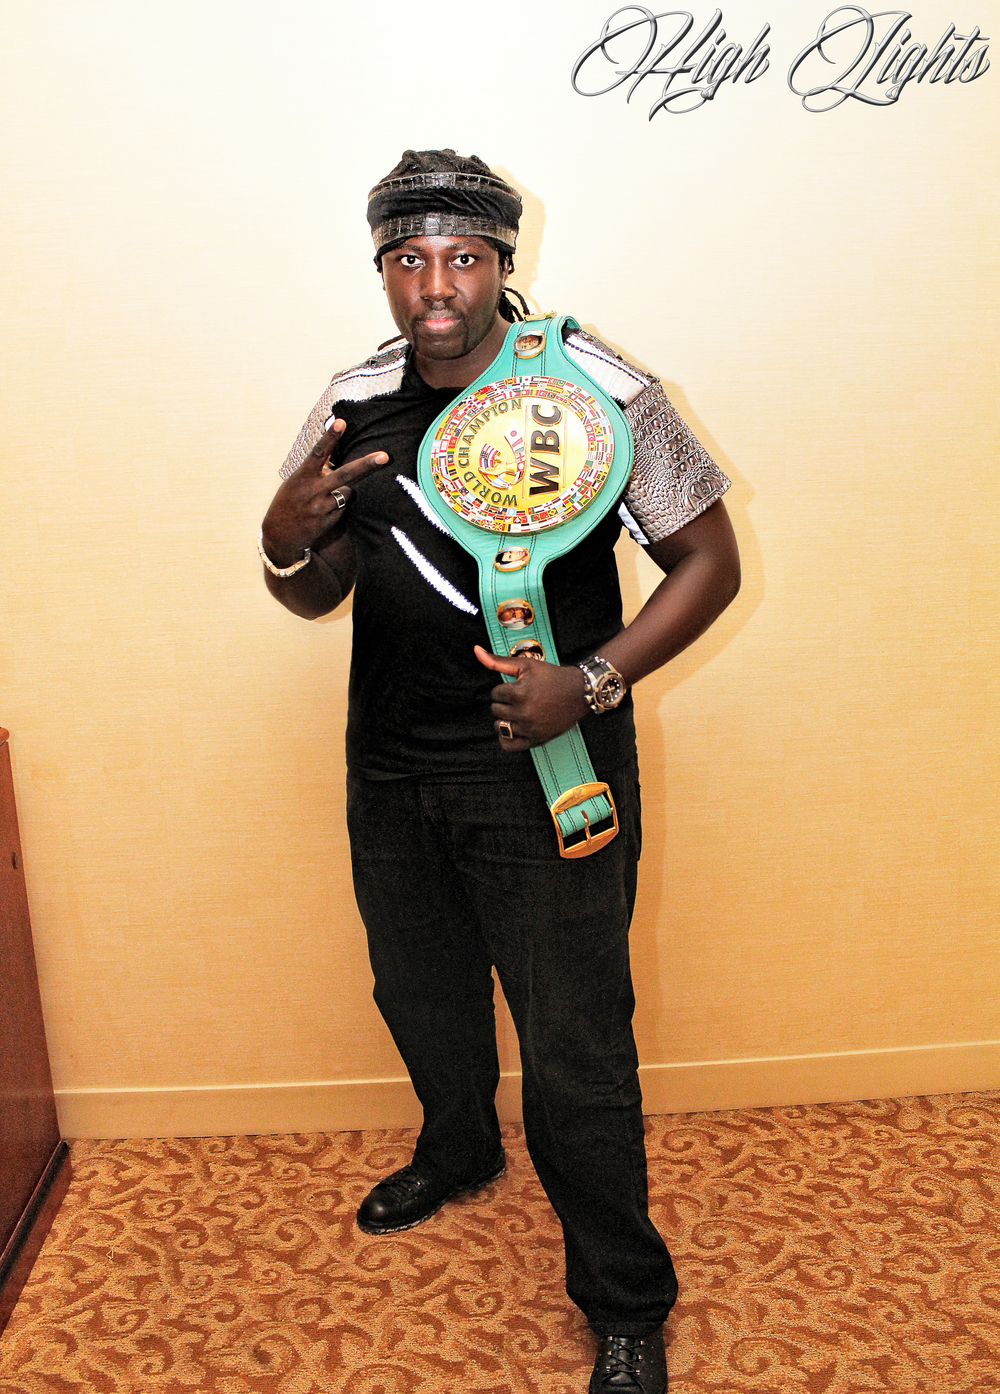 High Lights WBC World Champion Belt Wil.jpg